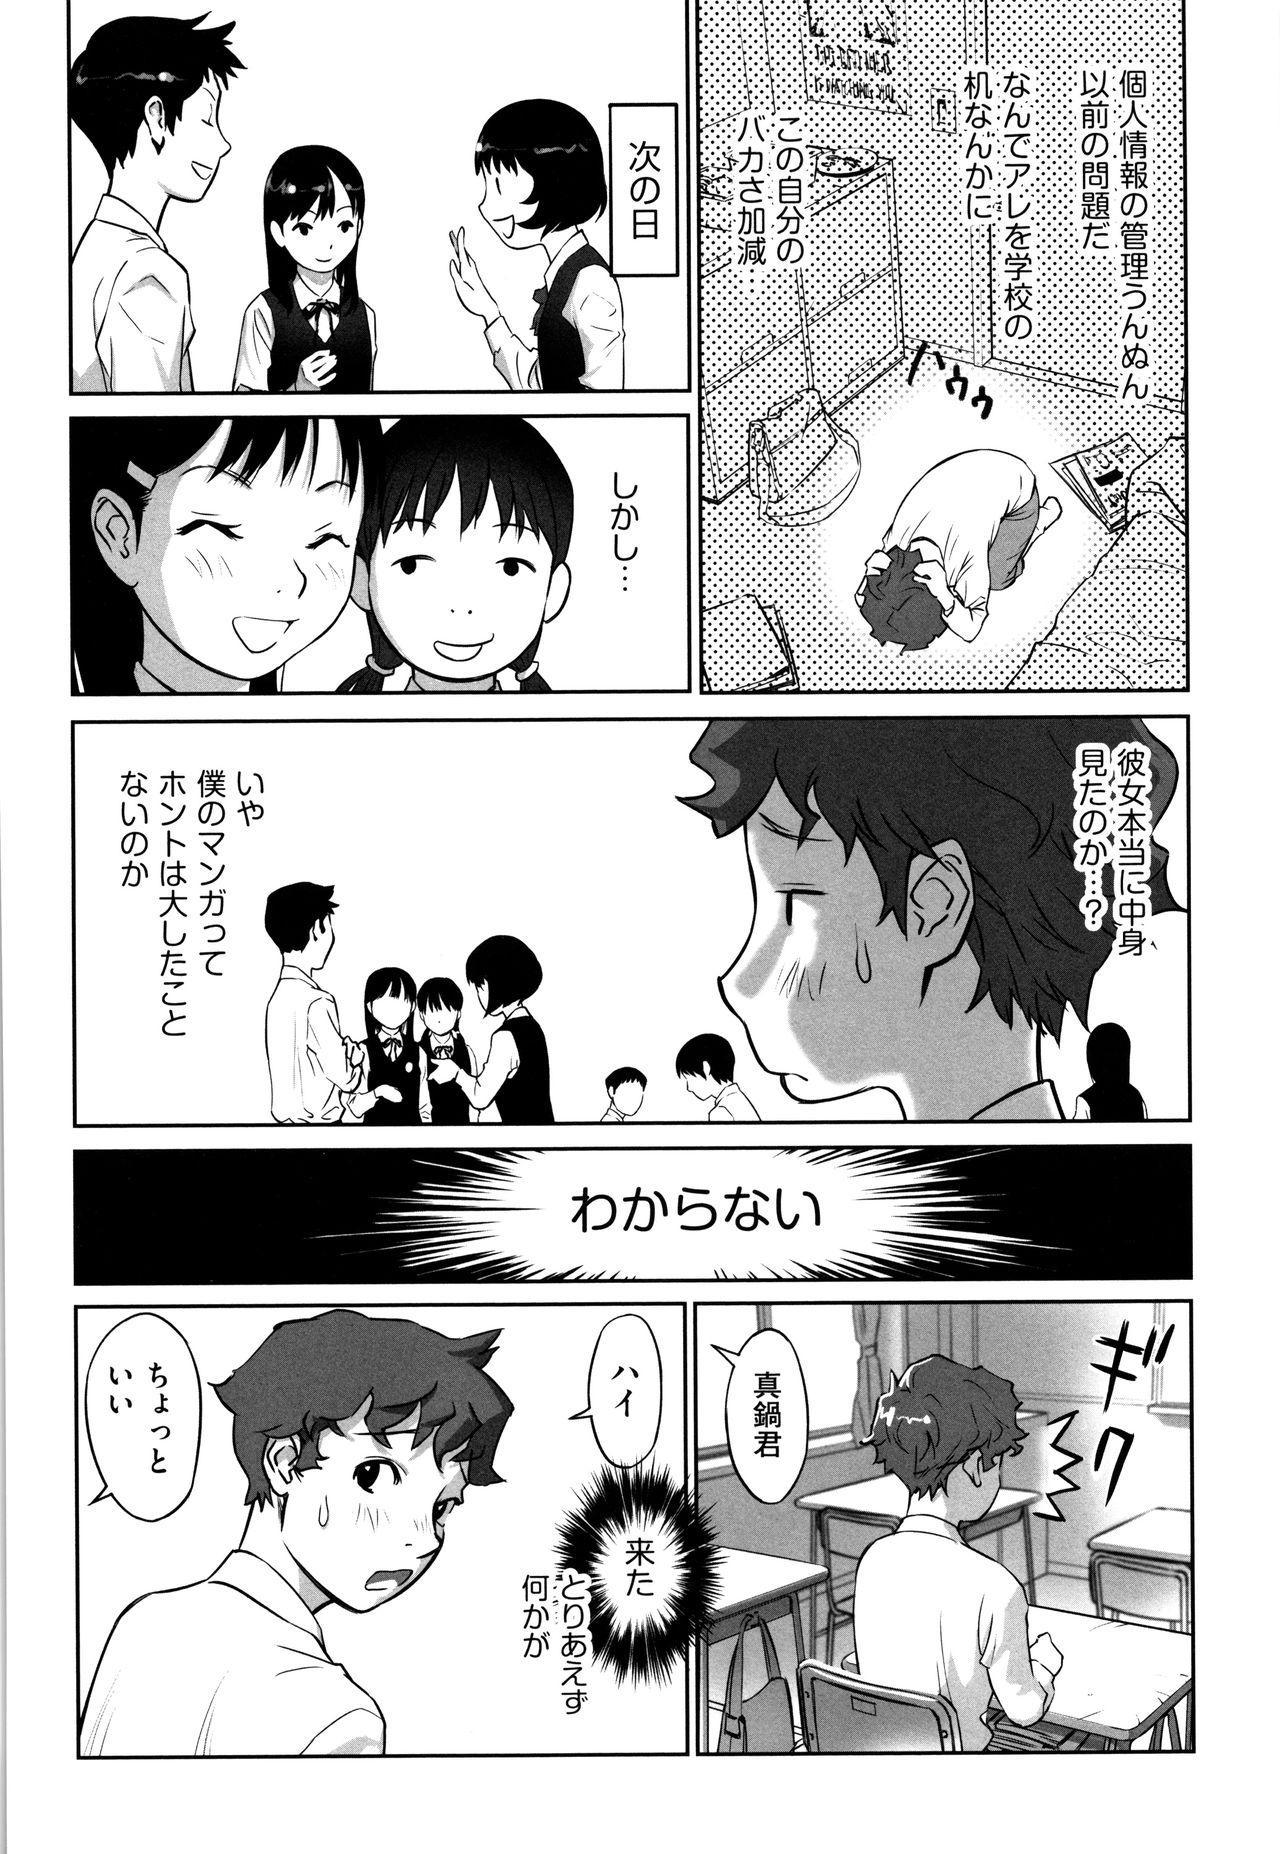 Shoujo Kumikyoku 7 40